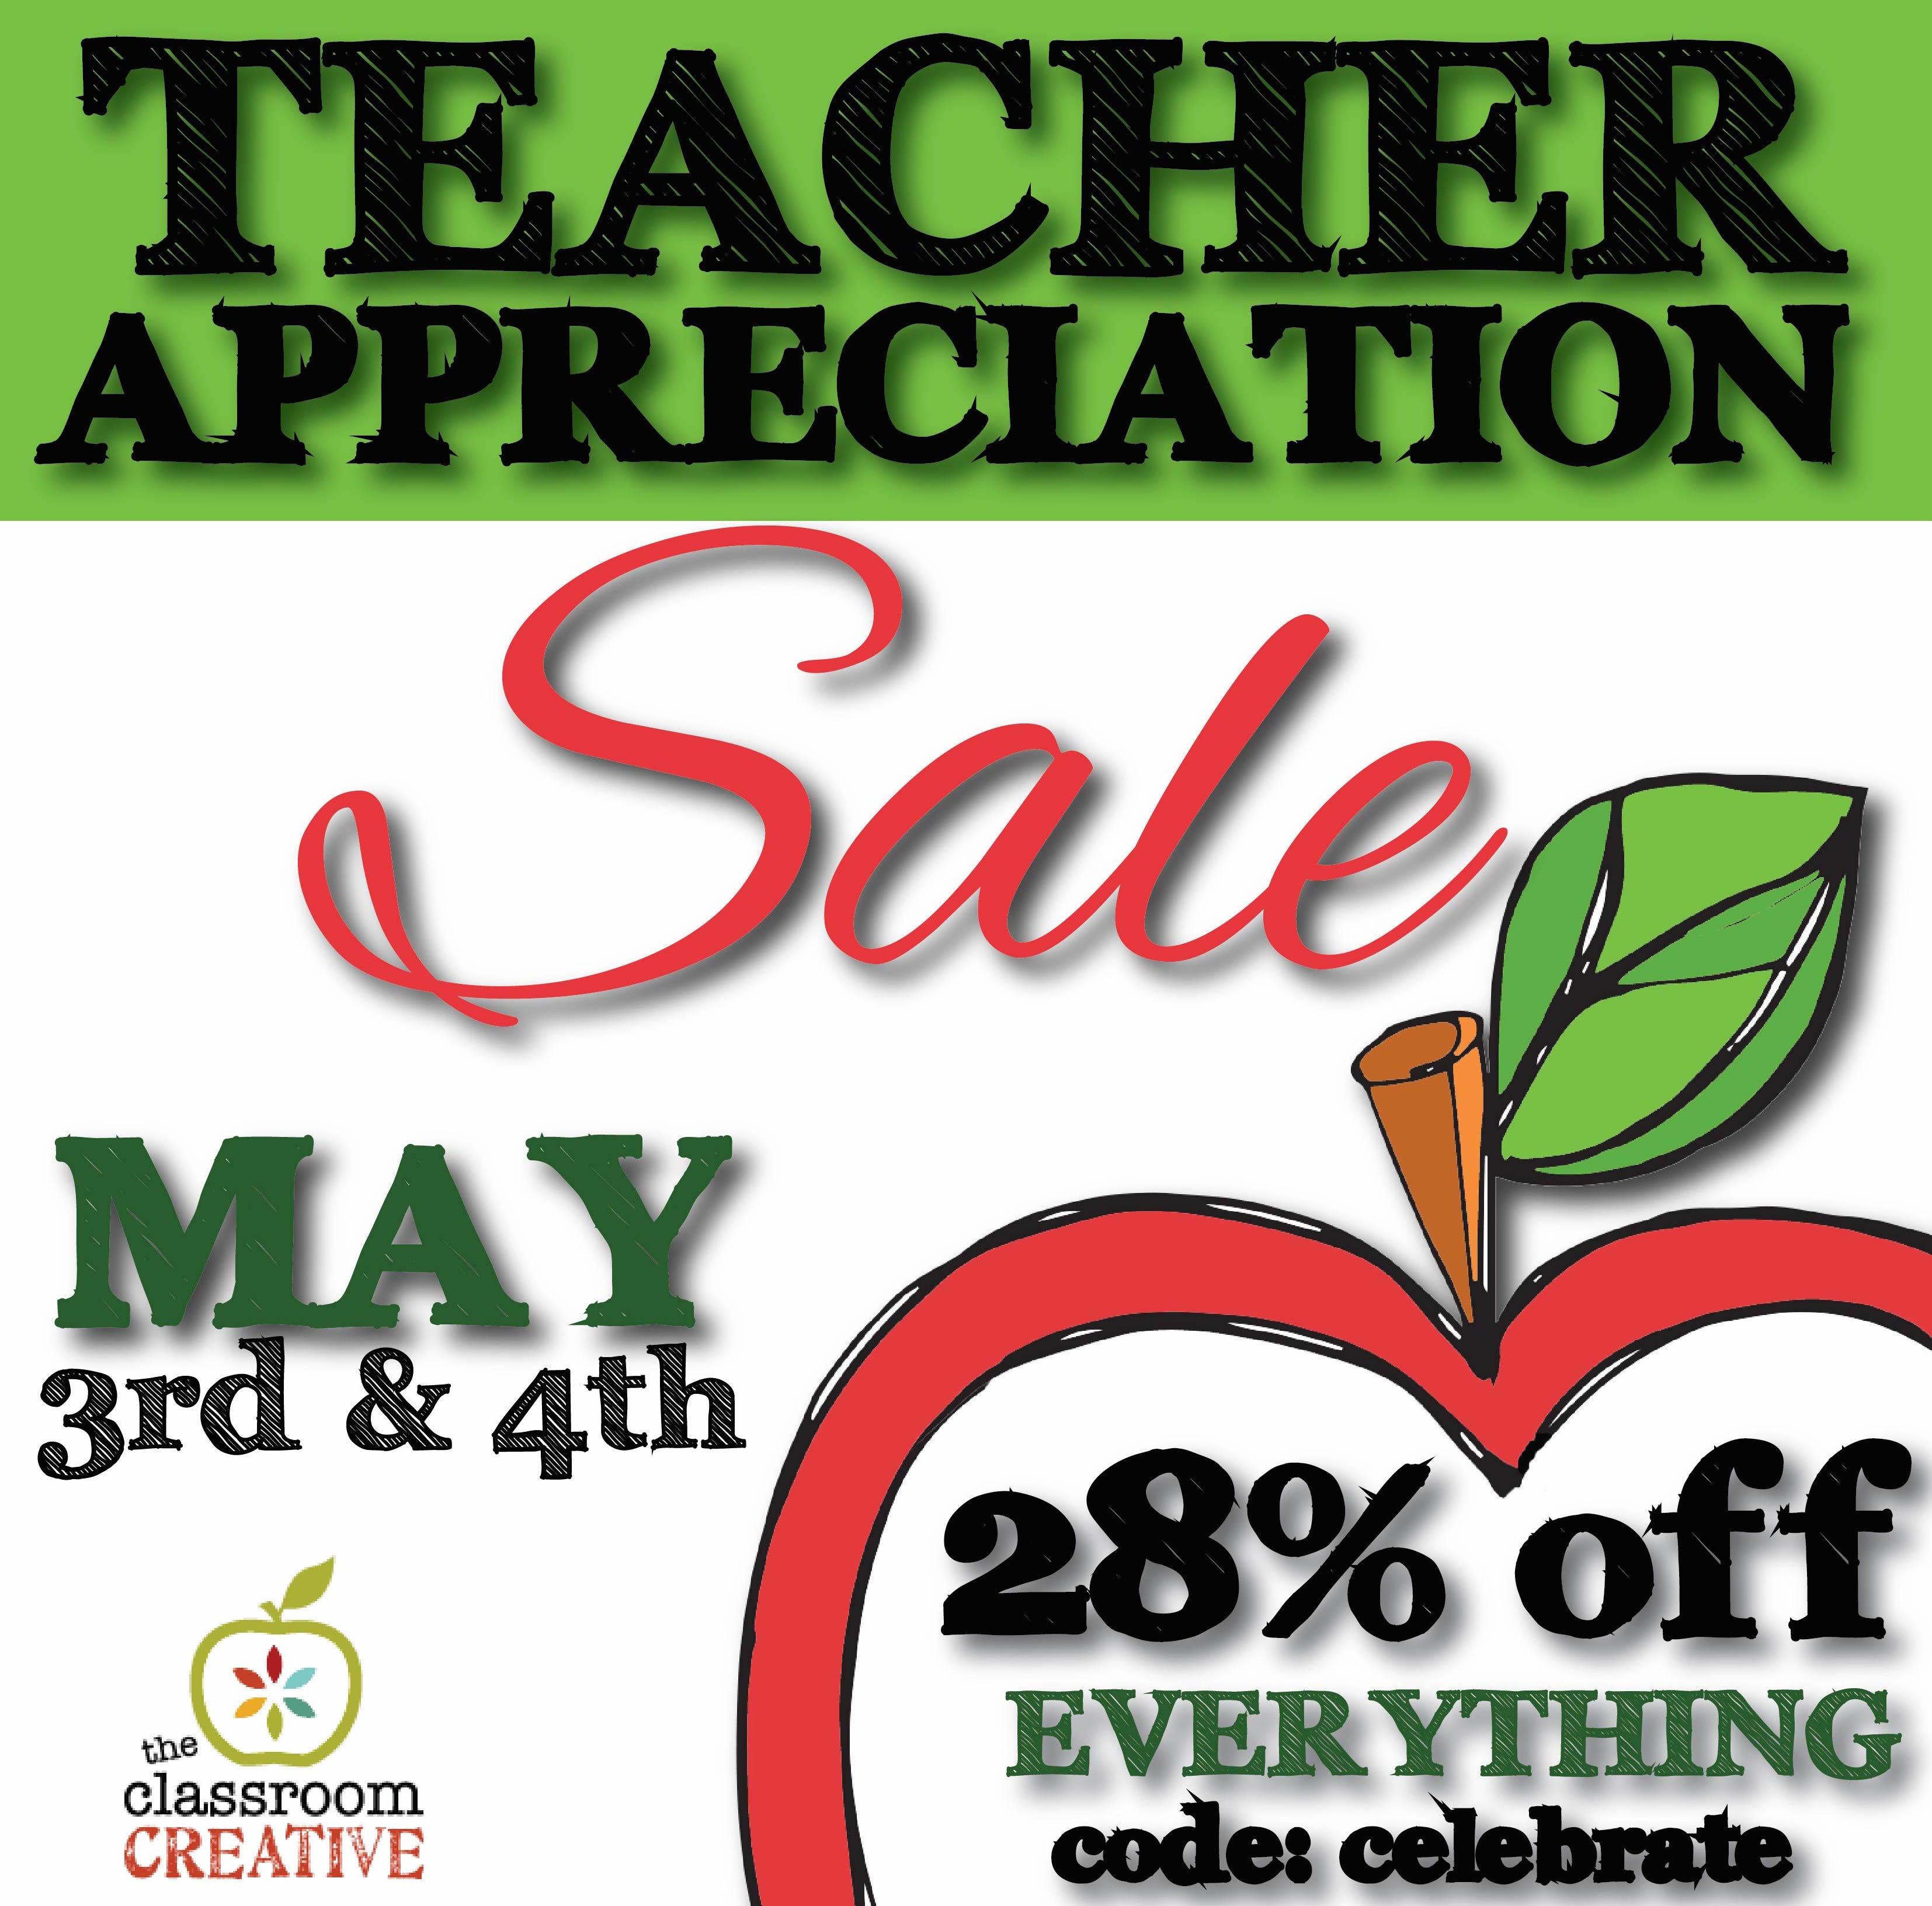 Teacher Appreciation Sale and Wishlist Top 3